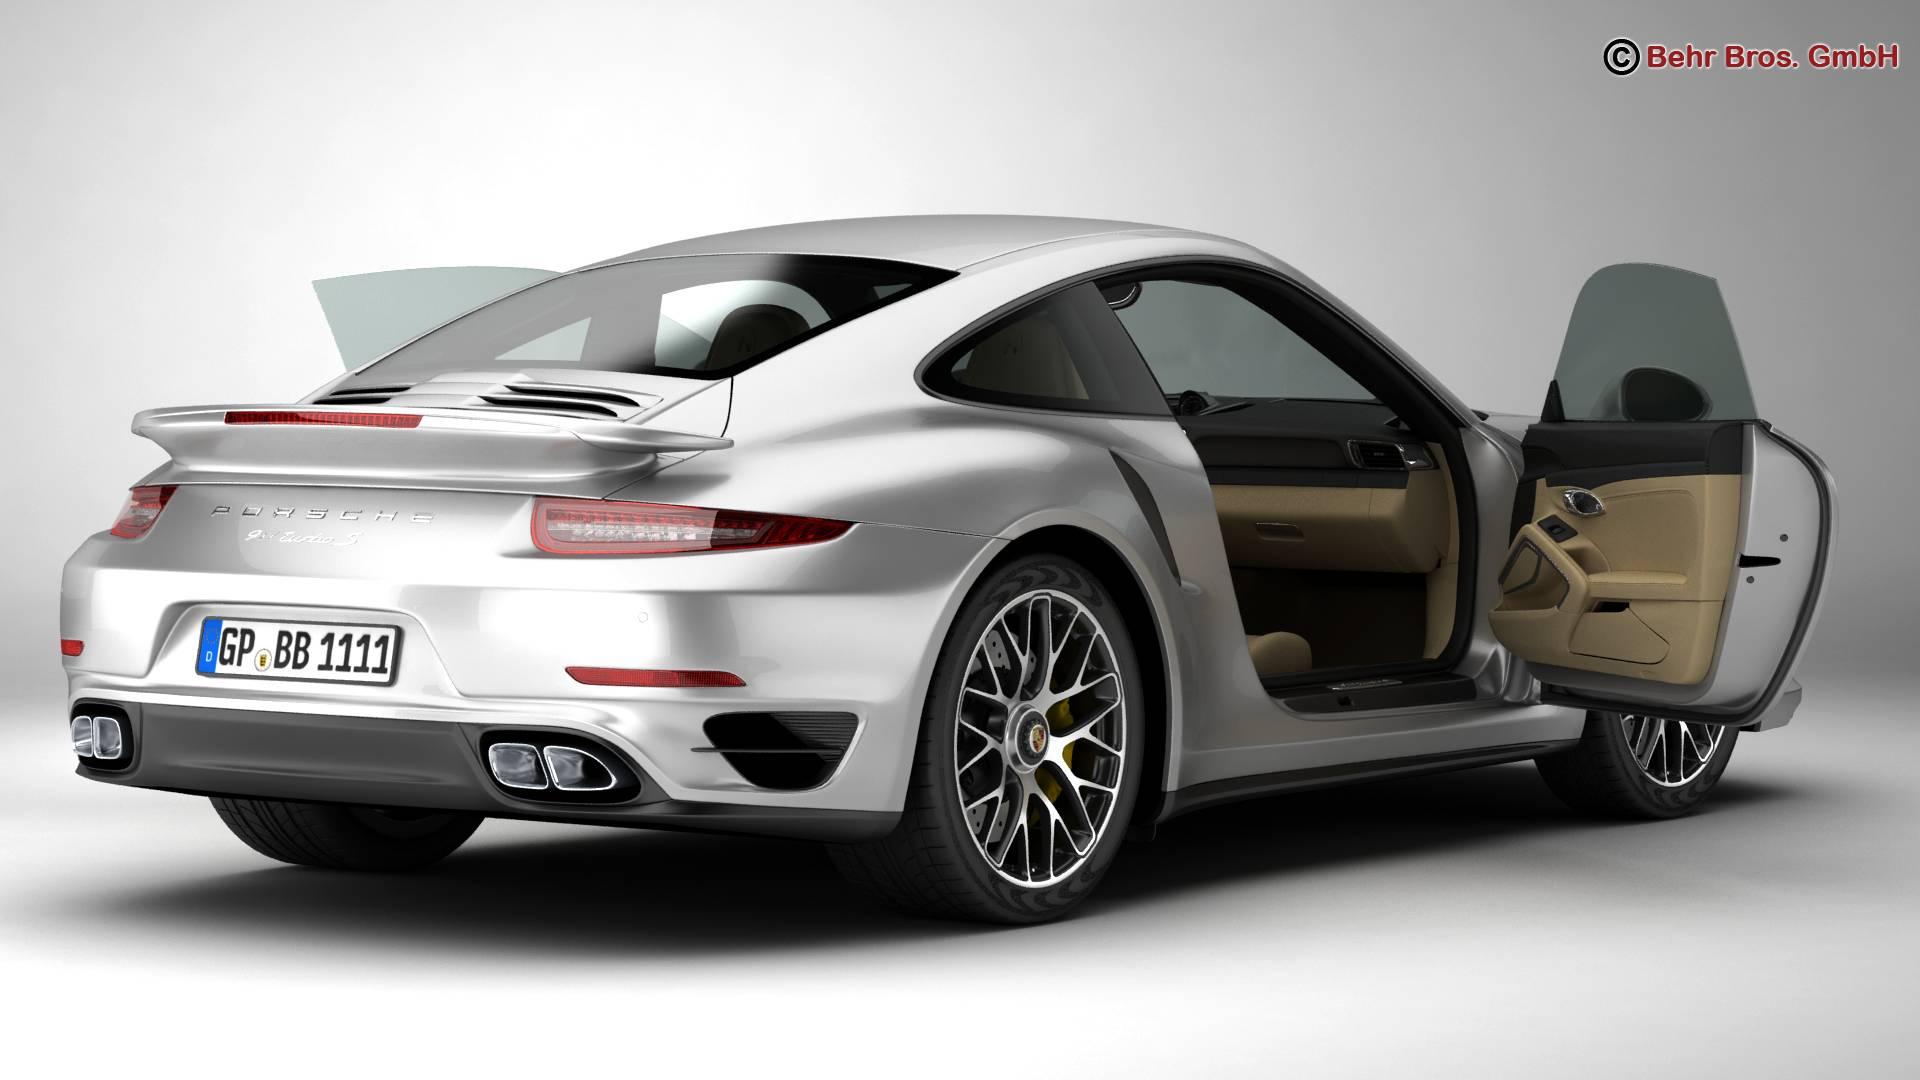 porsche 911 turbo s 2014 3d model 3ds max fbx c4d lwo ma mb obj 212479